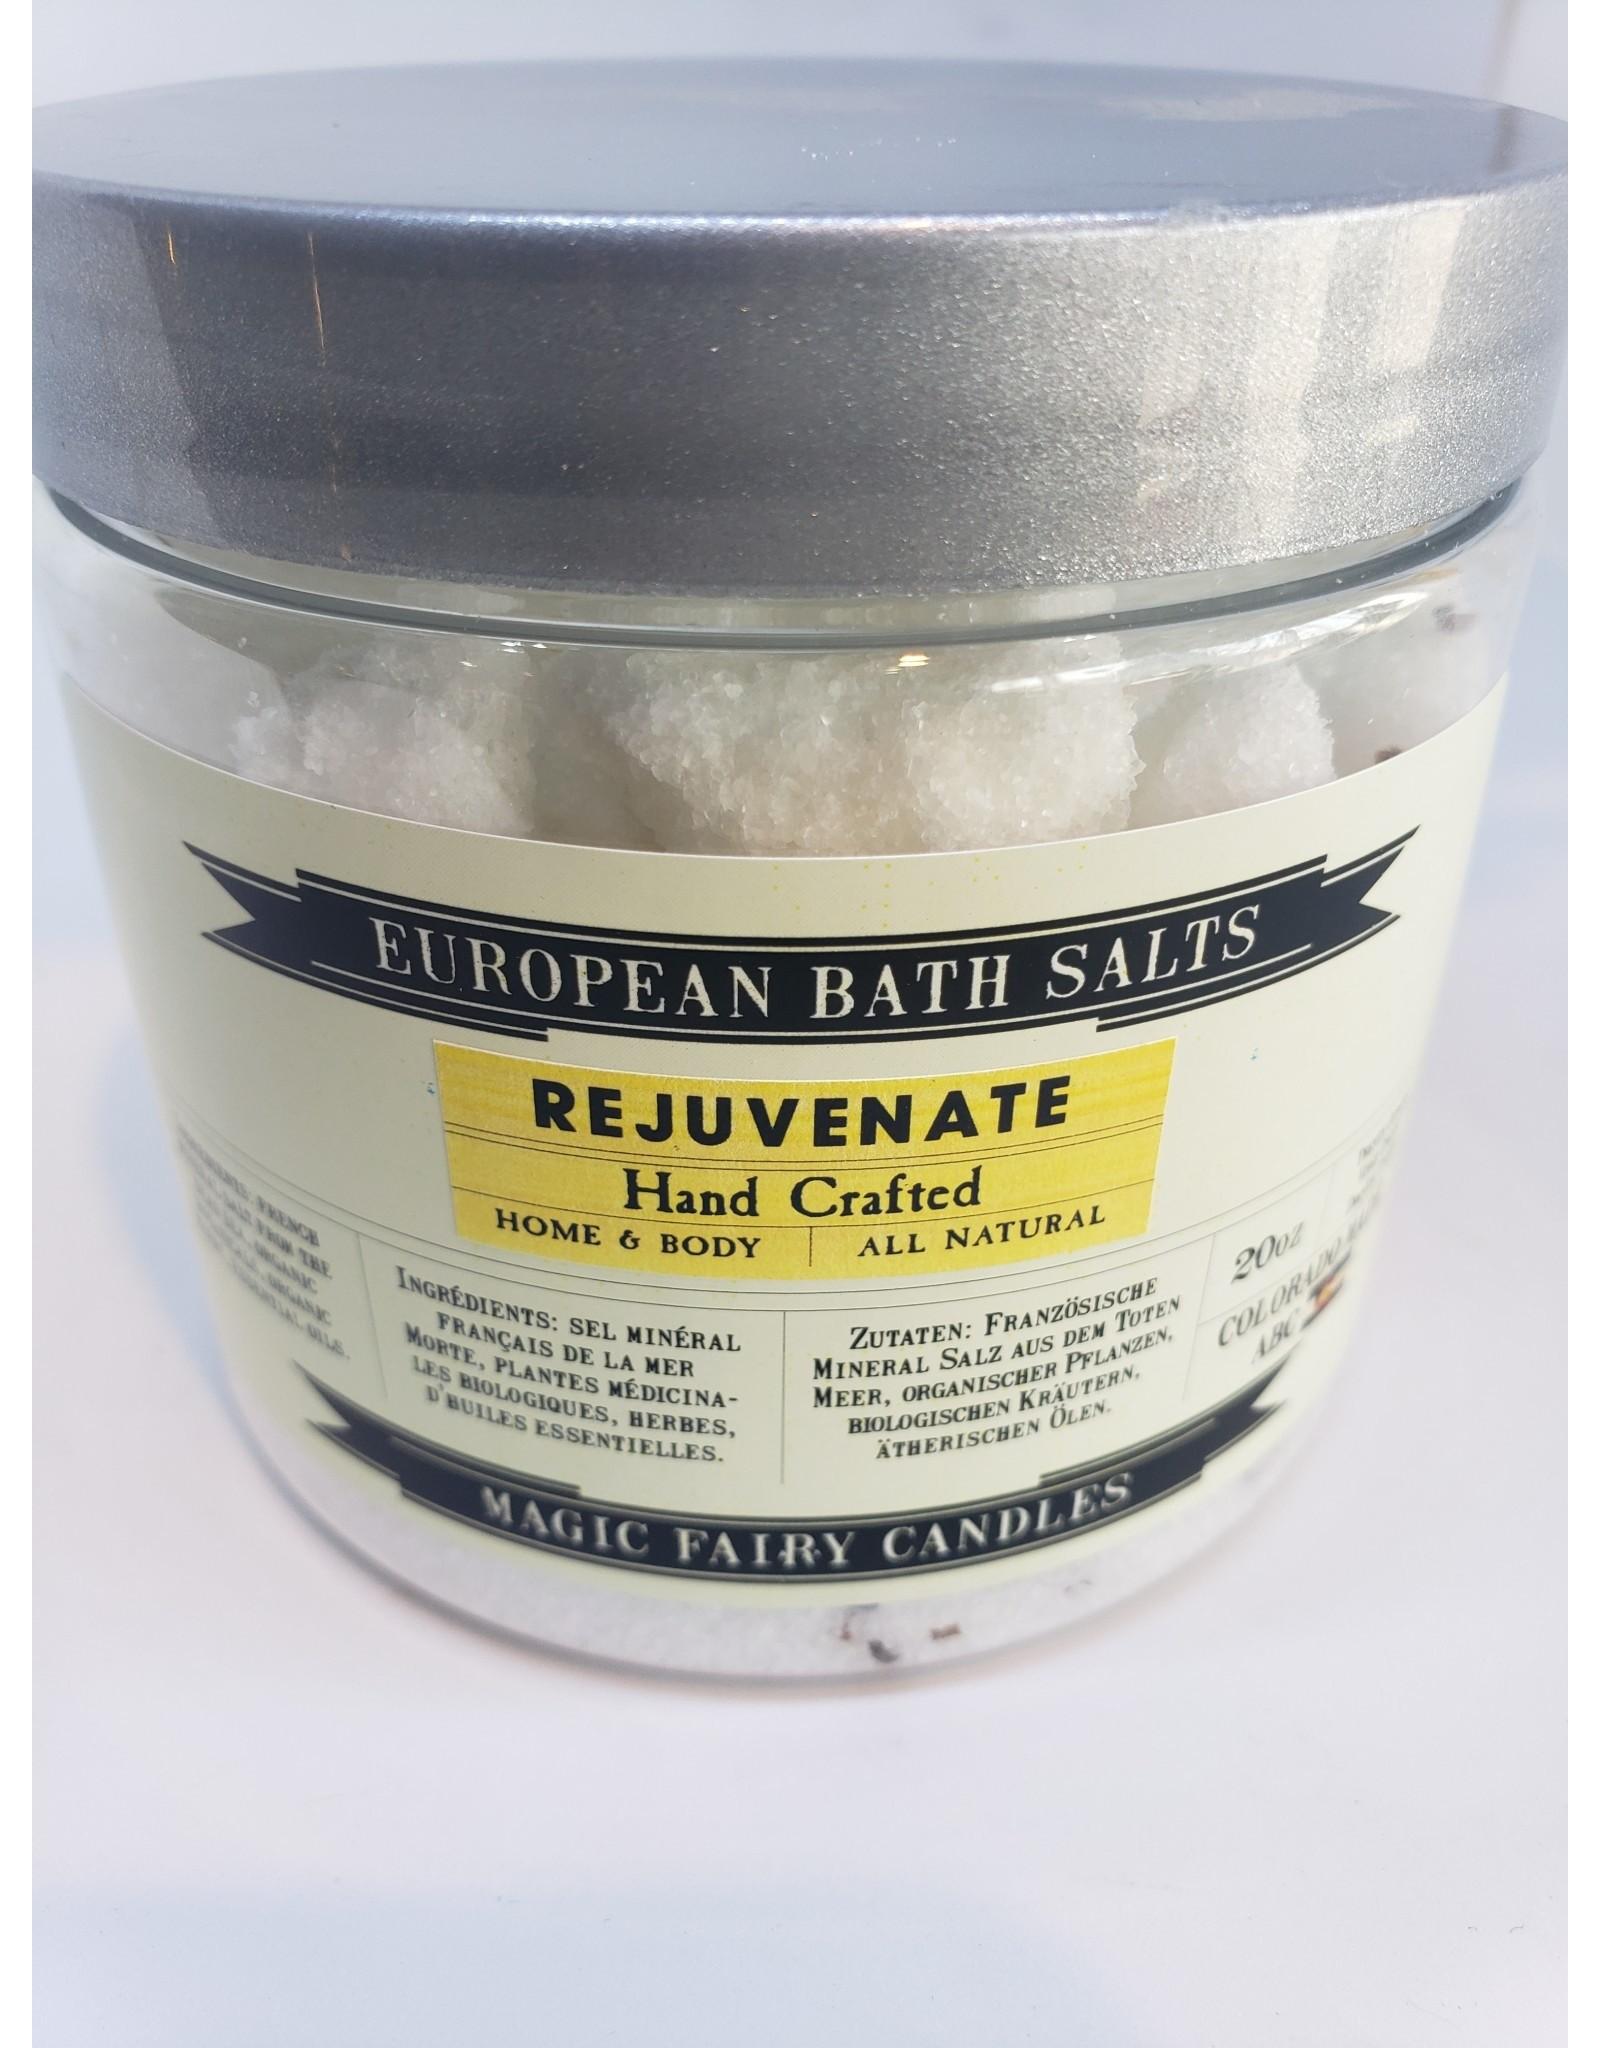 Bath Salt 16 oz. - Rejuvenate